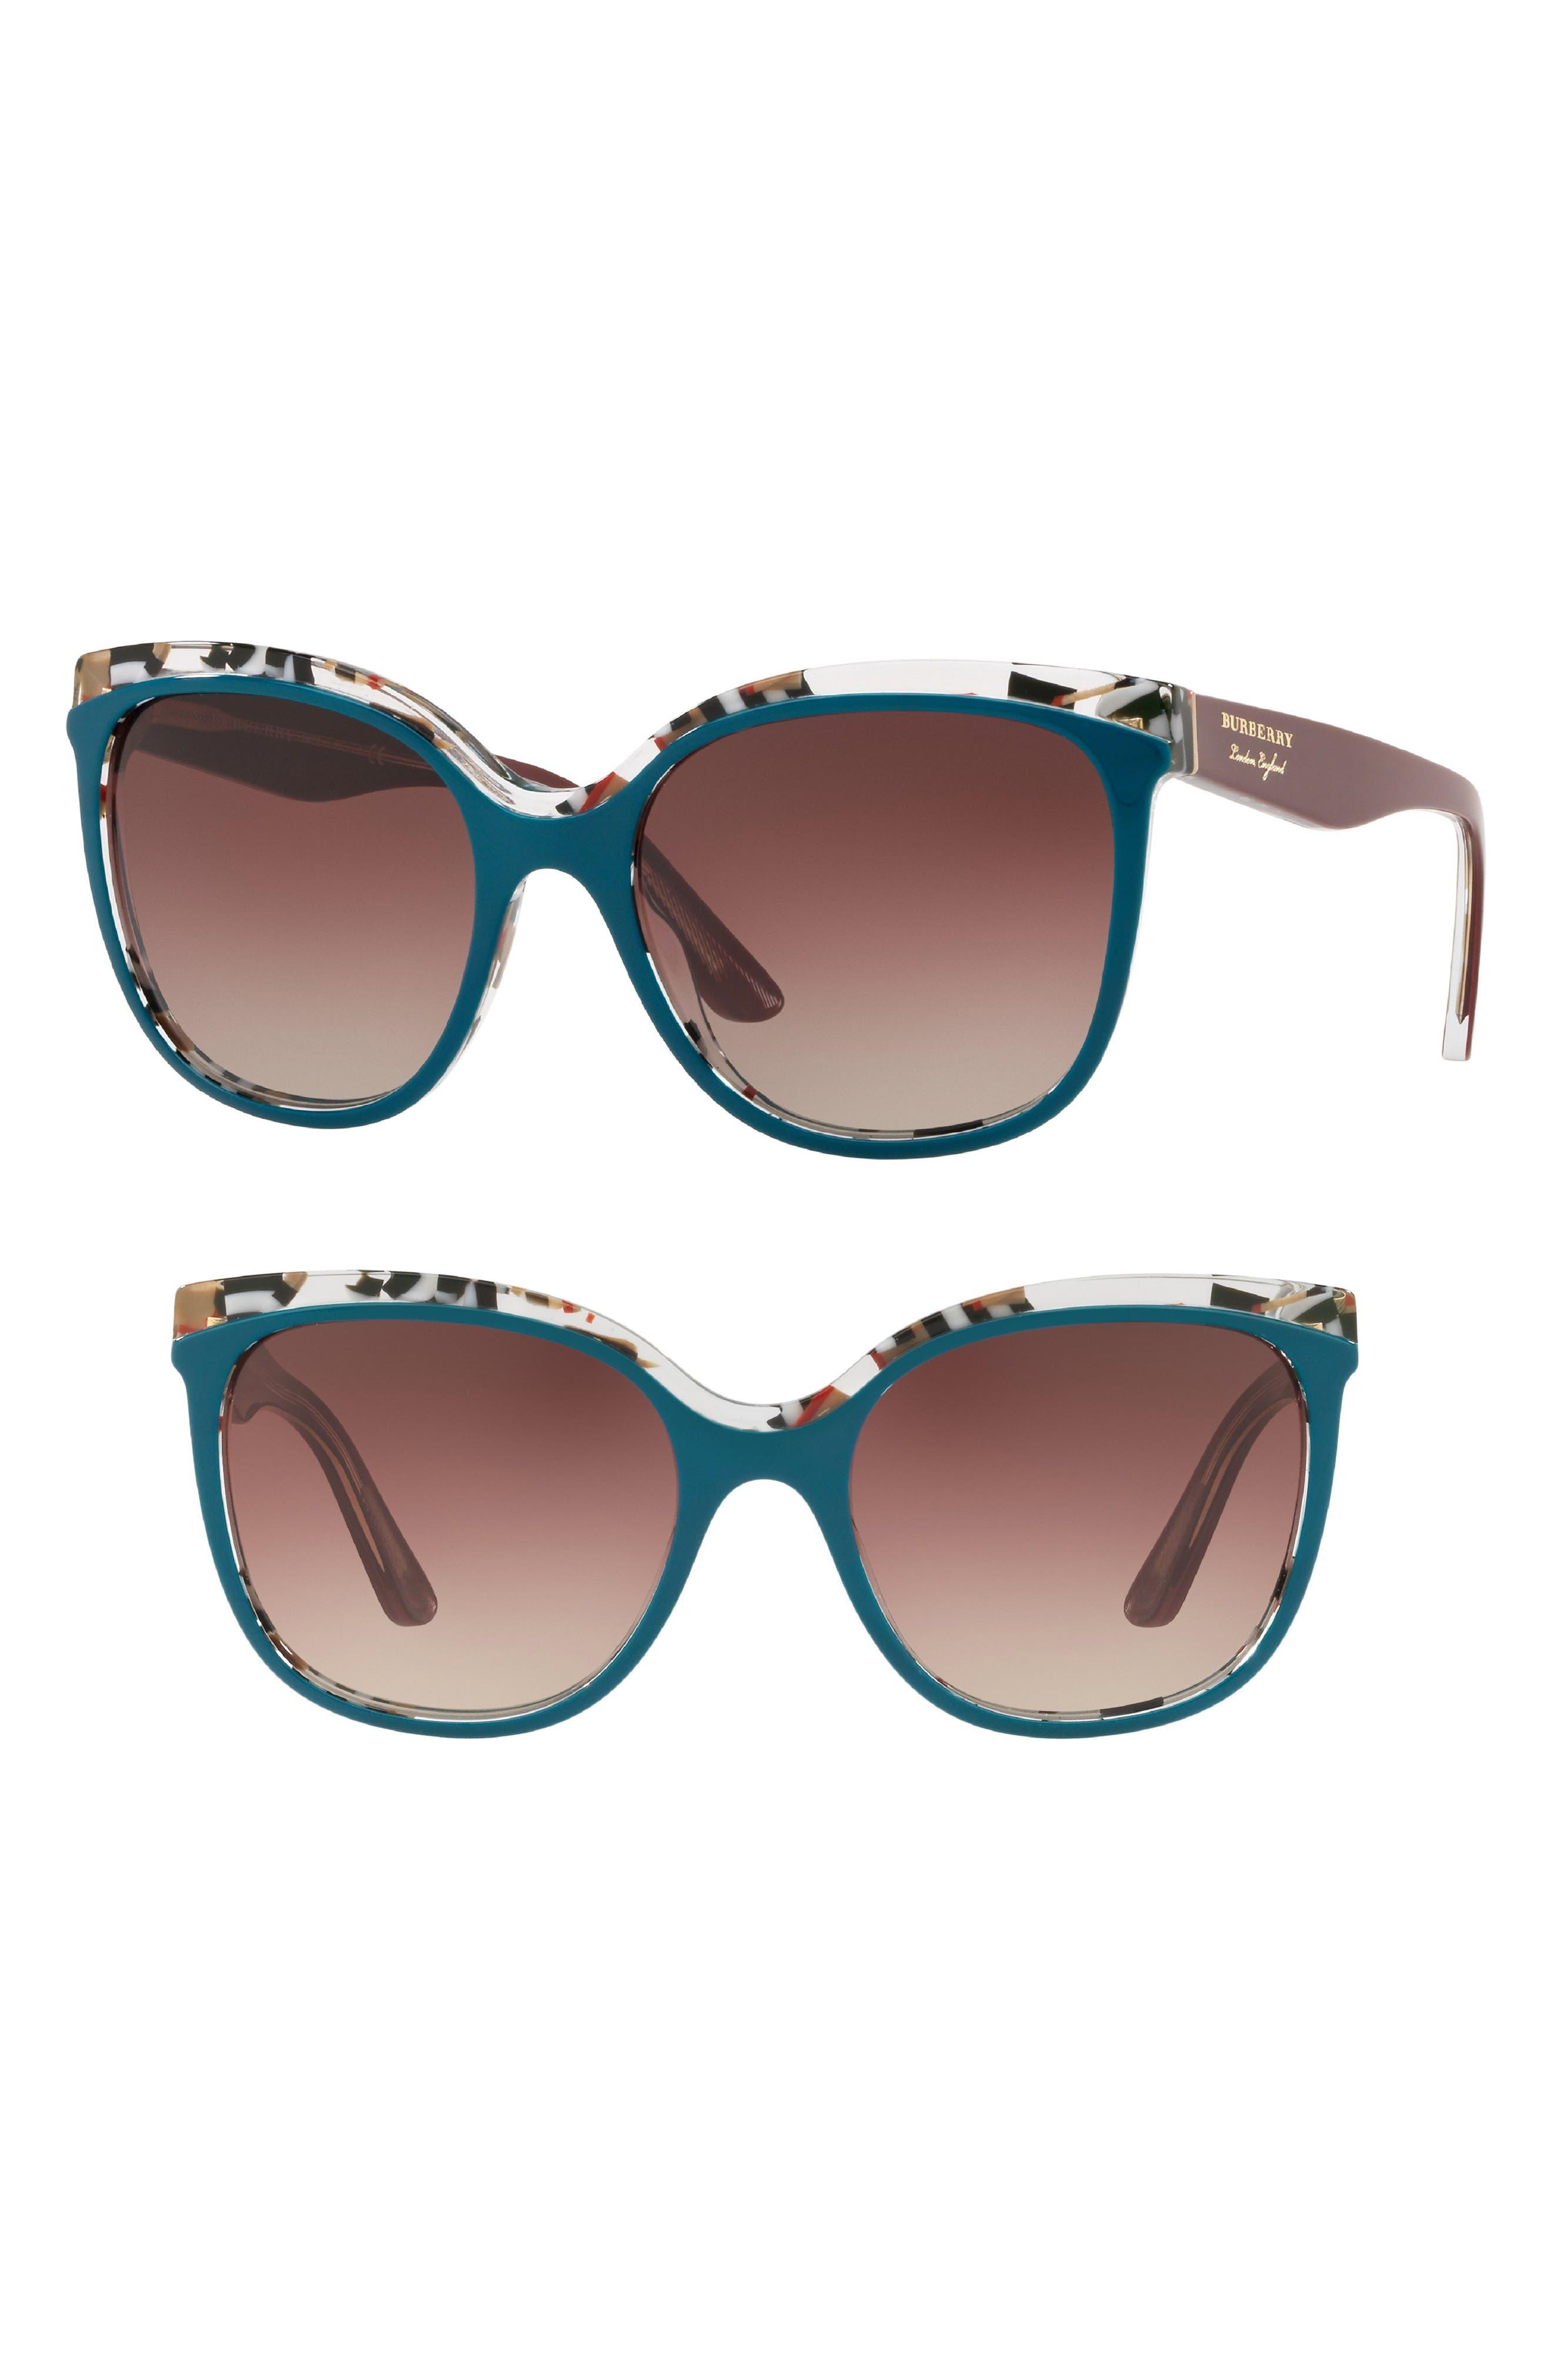 9b05f45a15 burberry sunglasses